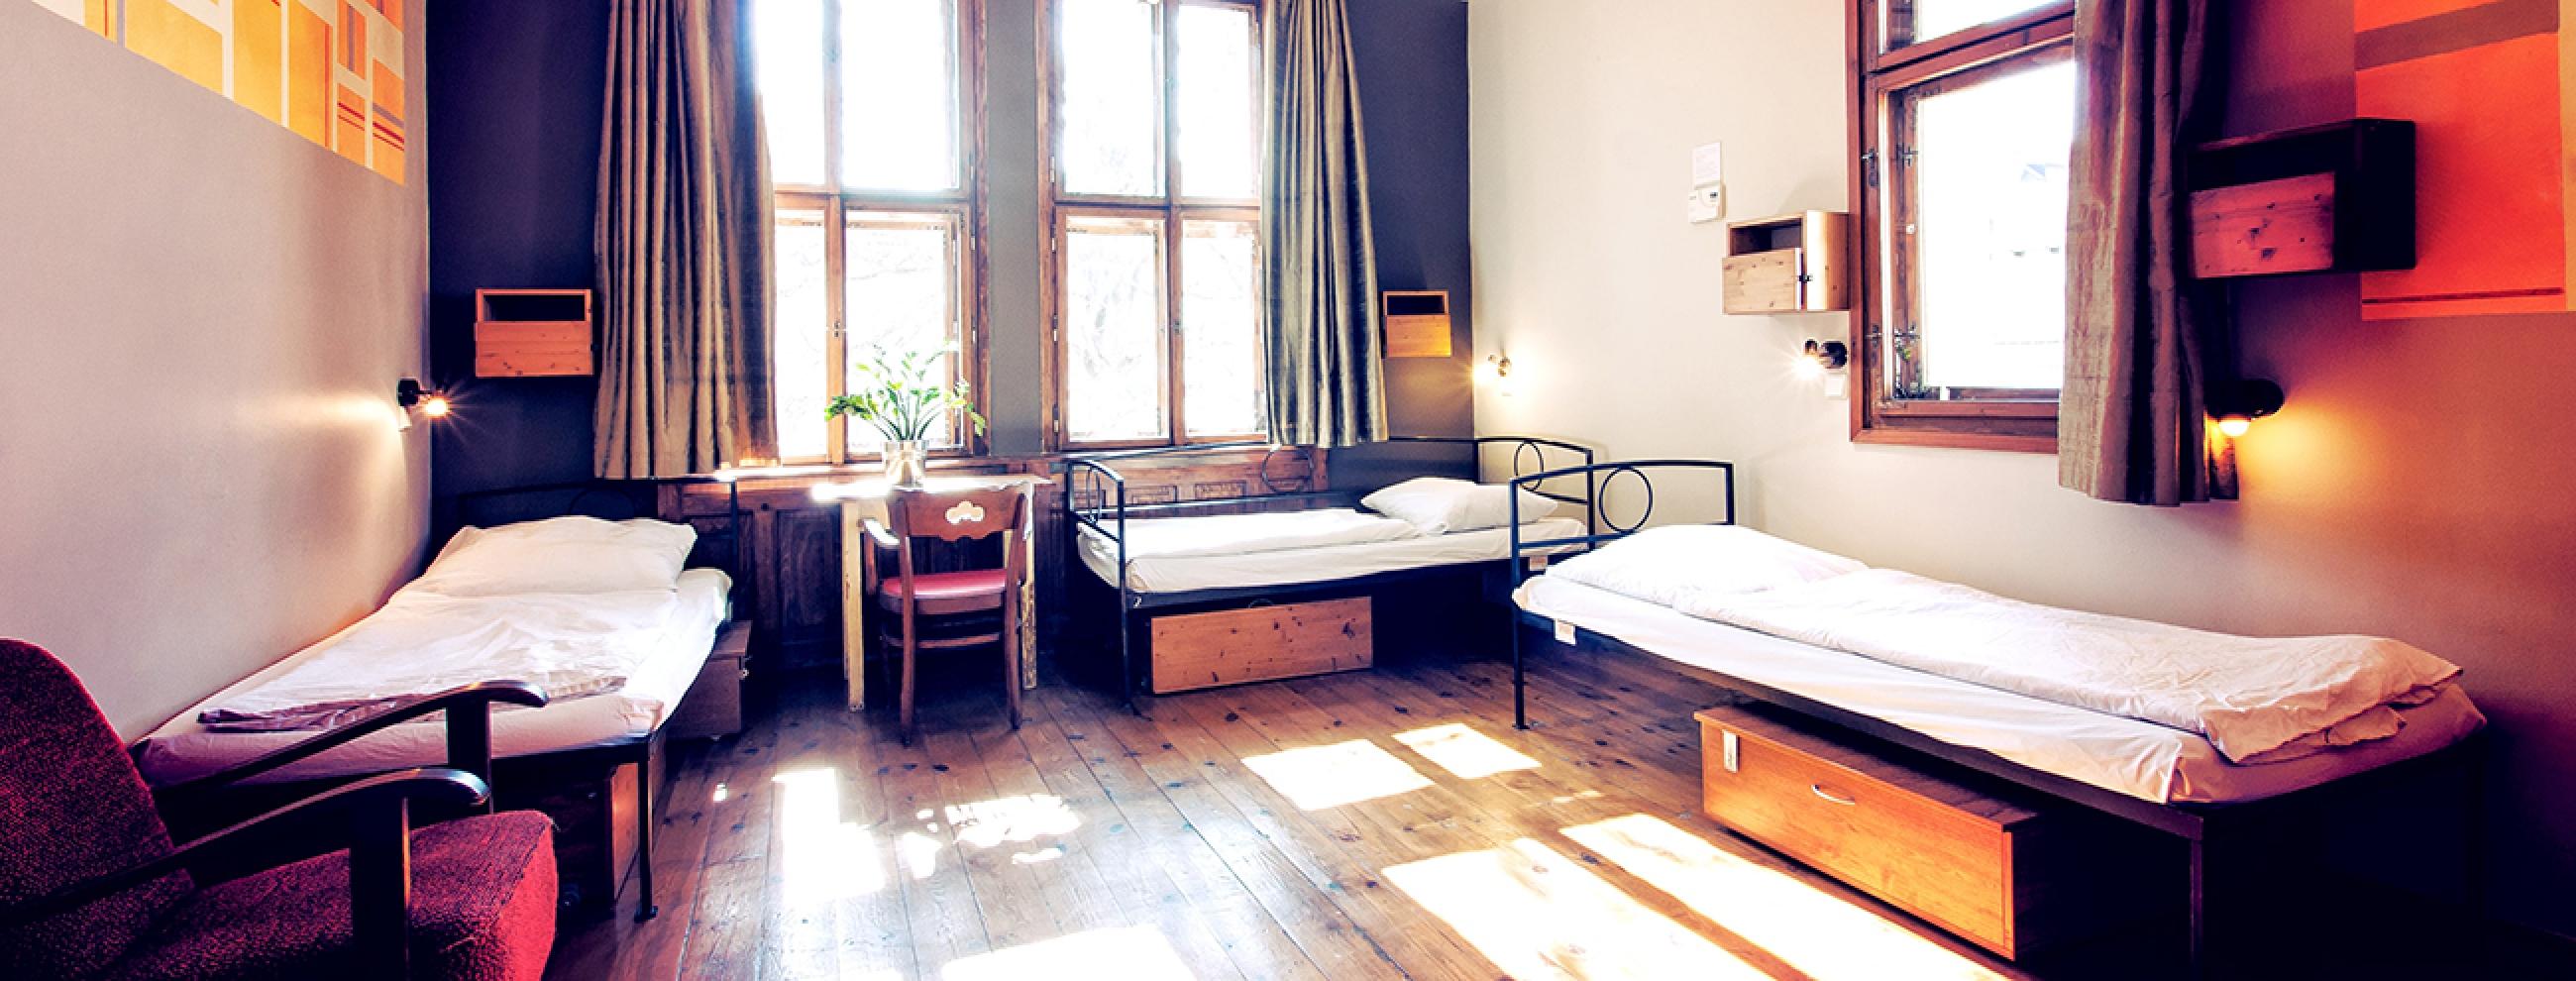 Sir Toby S Hostel Prague Private Room